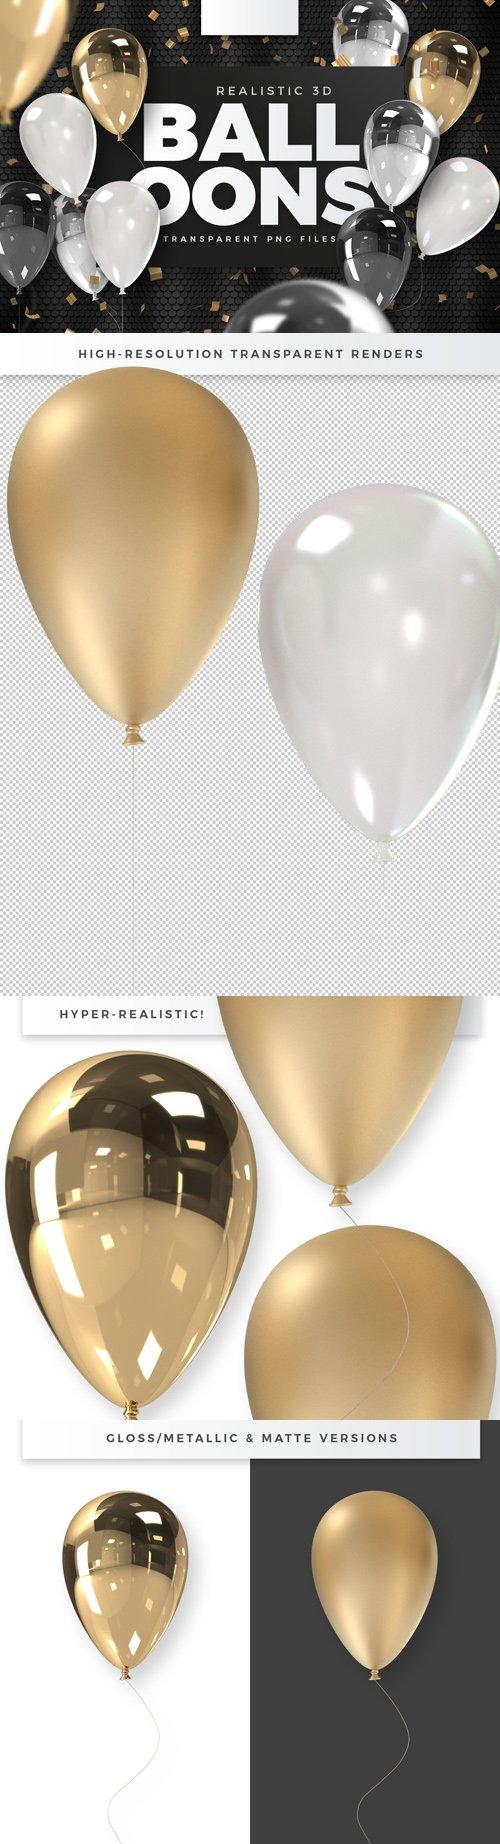 Realistic 3D Balloons - 3D Renders